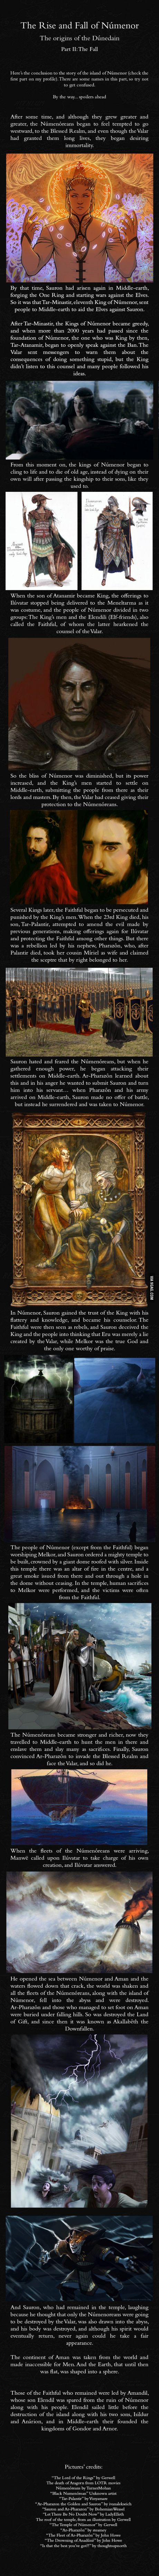 Númenor and the Dúnedain: Part II - J.R.R. Tolkien's mythology